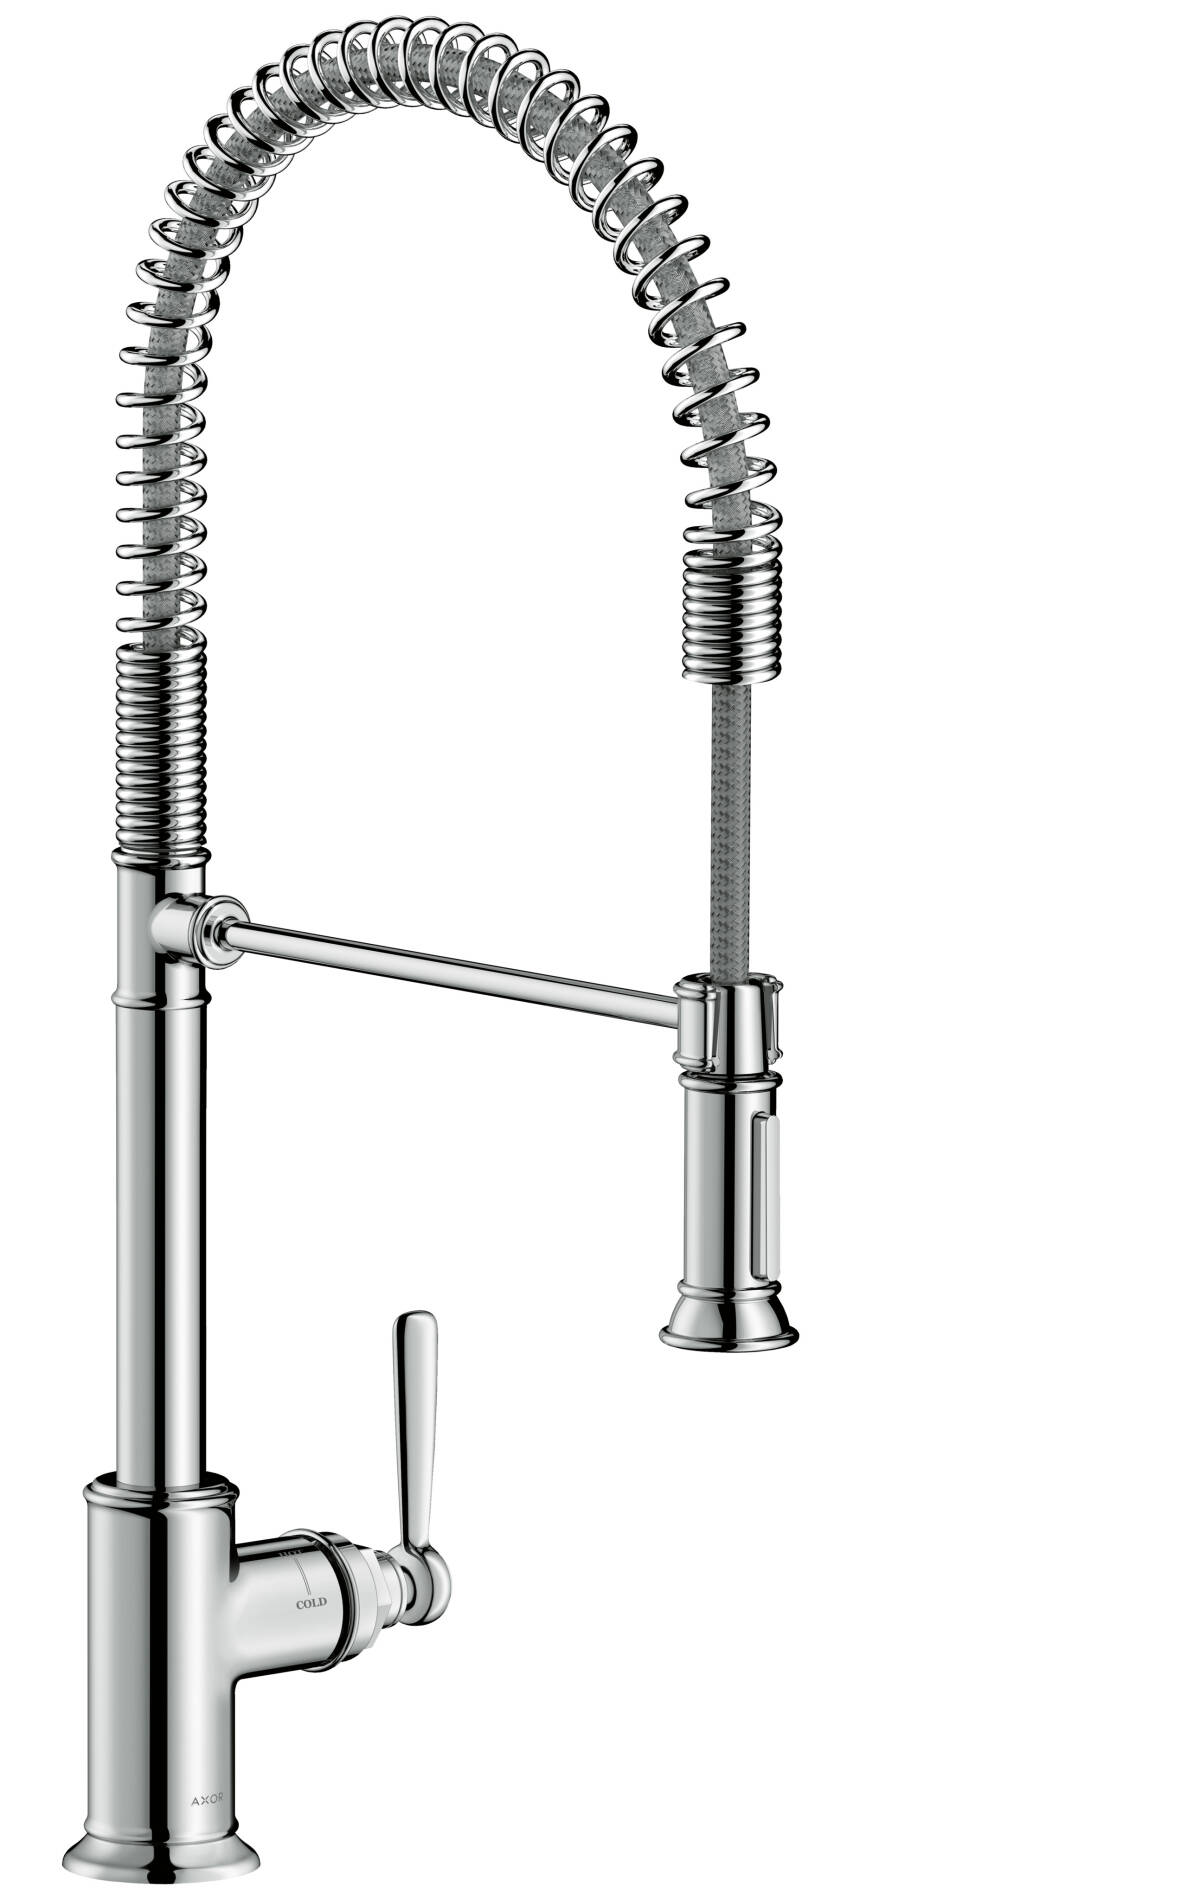 Single lever kitchen mixer 210 Semi-Pro, Chrome, 16582000